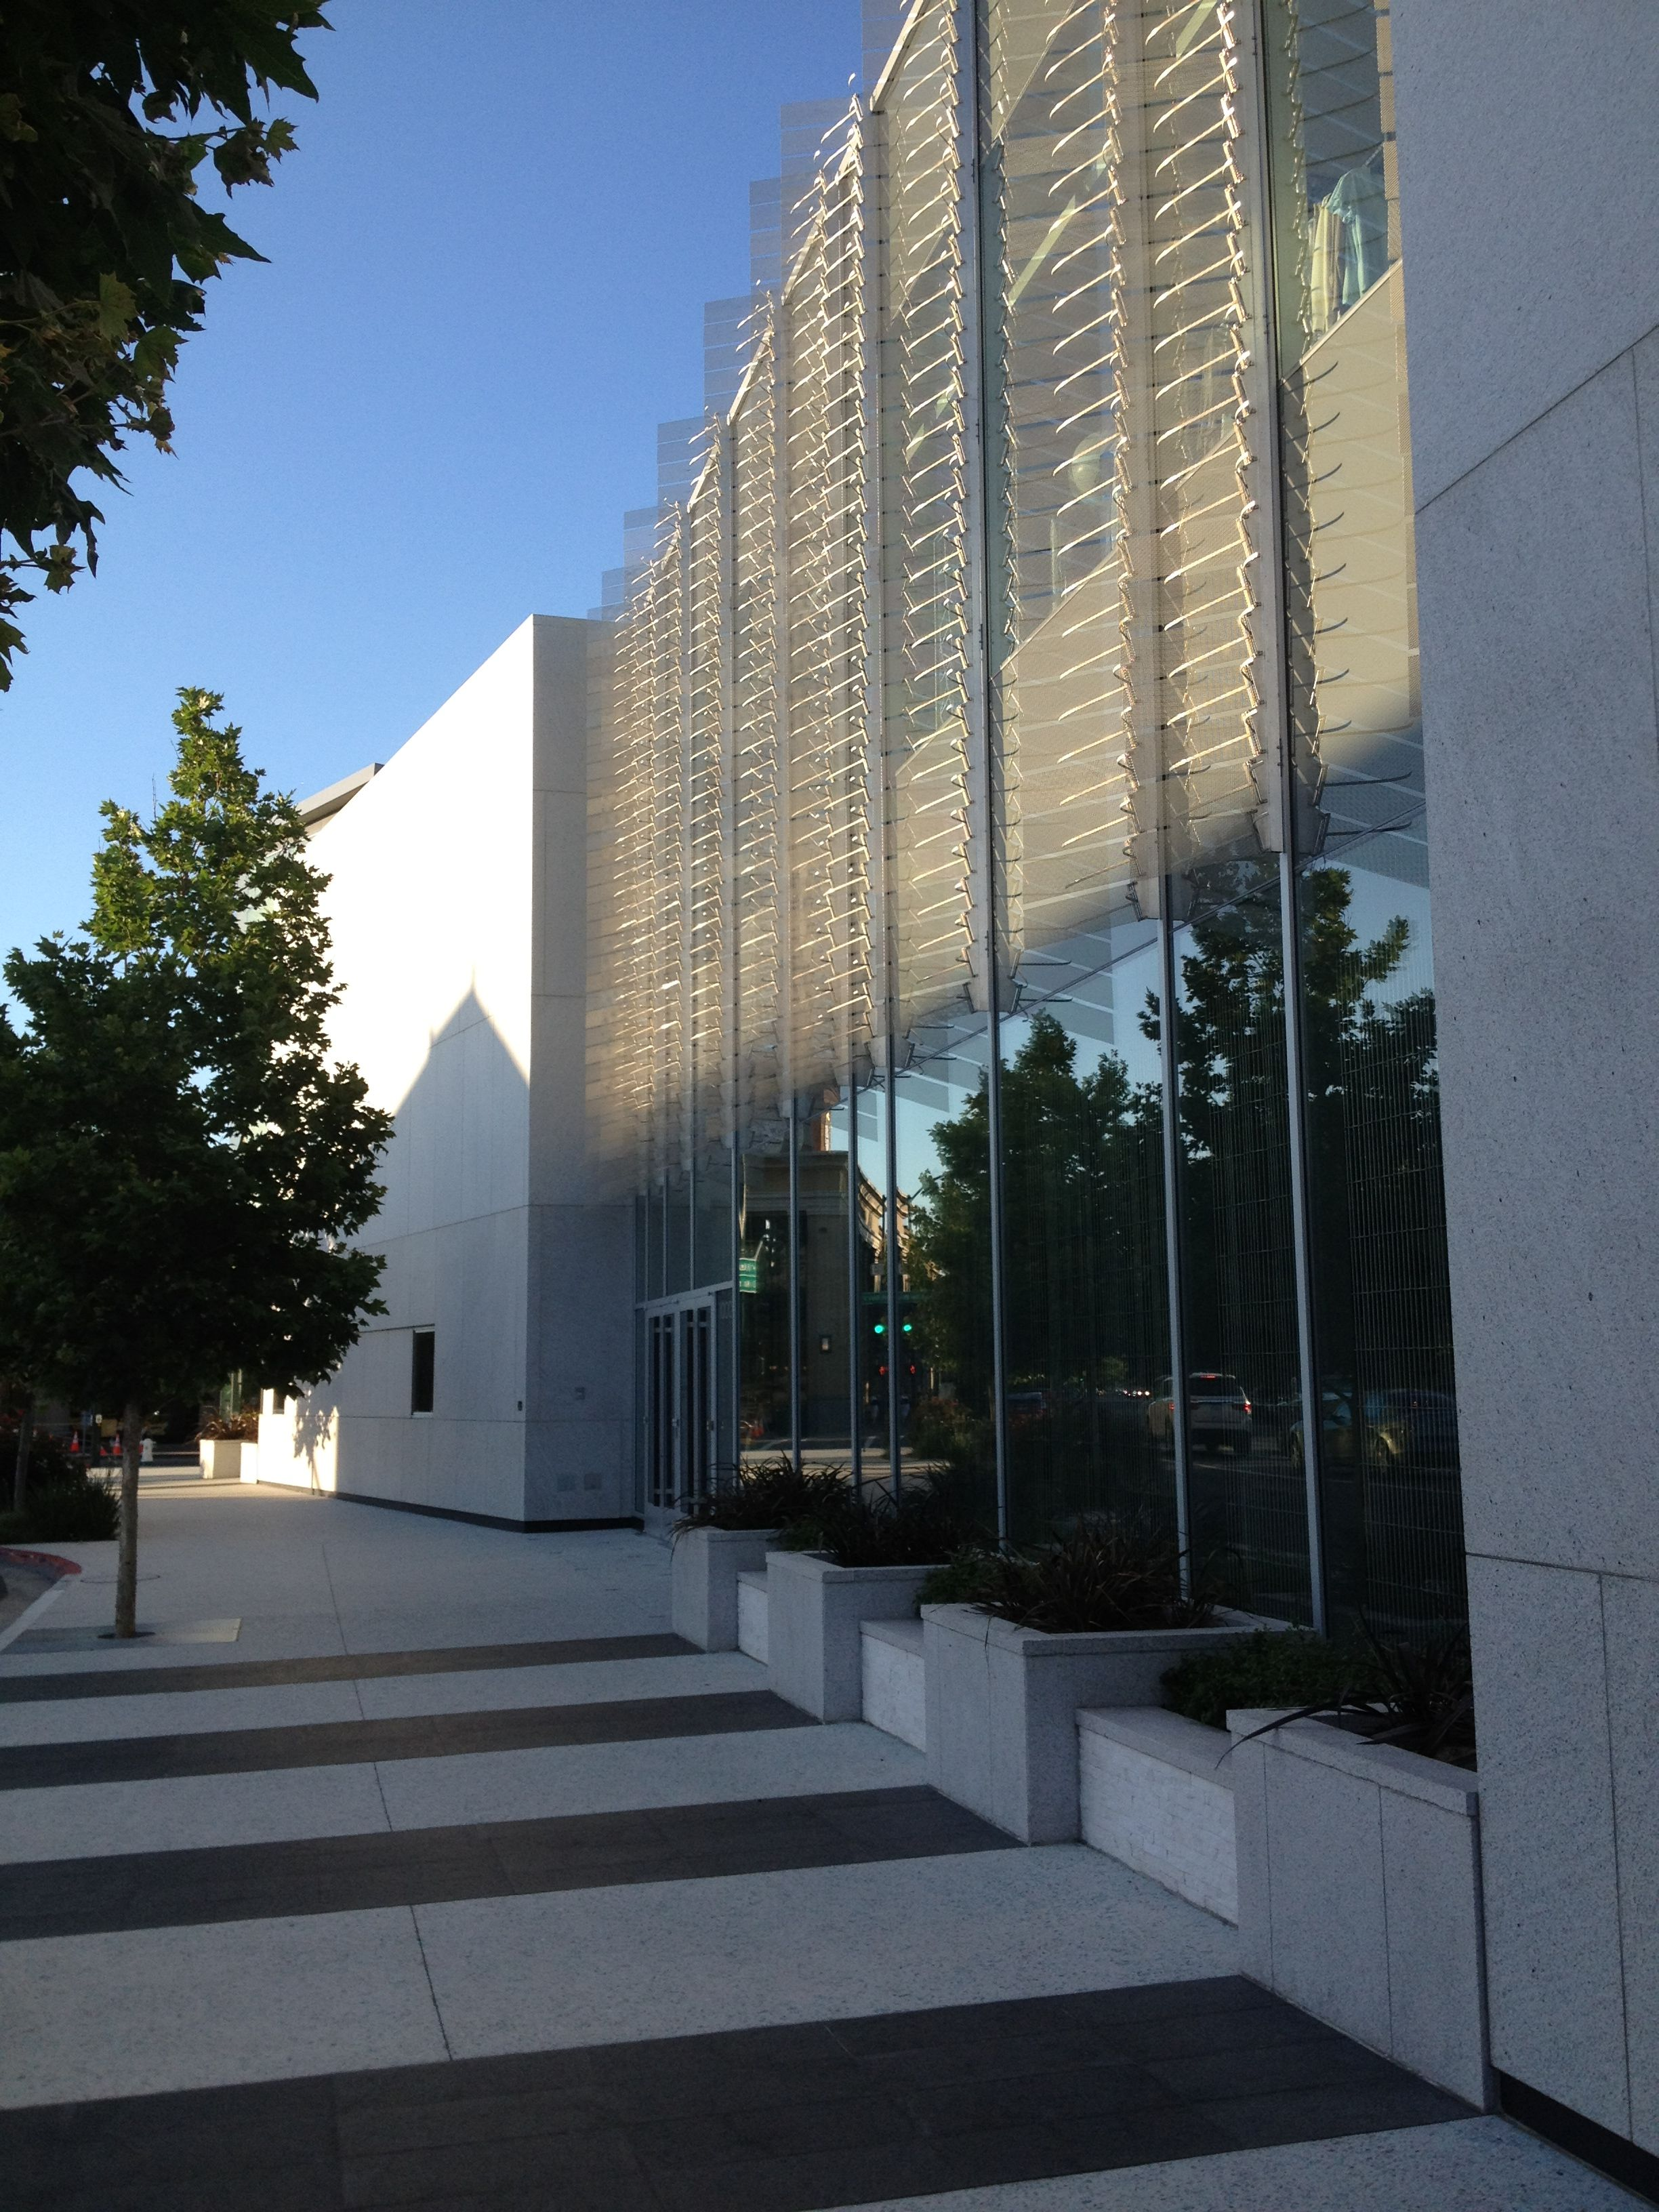 Neiman Marcus, Walnut Creek, CA. Bay Area artist Ned Kahn